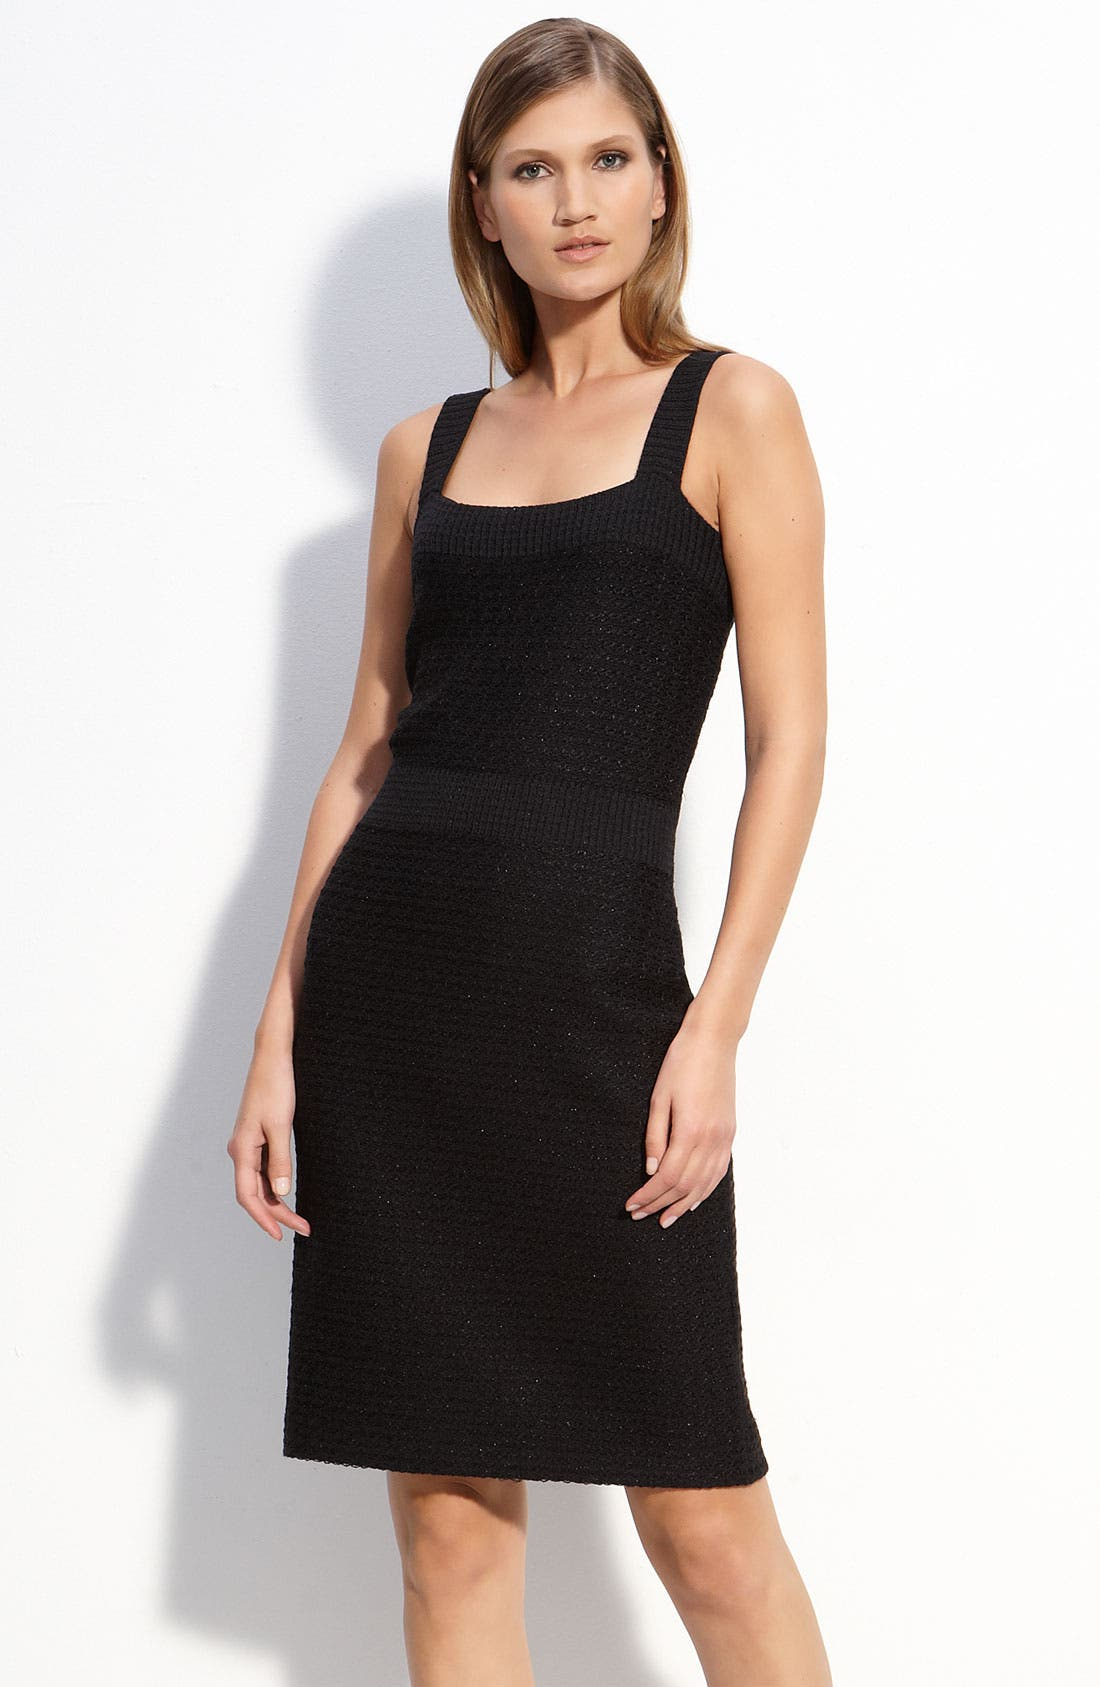 Main Image - St. John Collection Sparkle Knit Dress